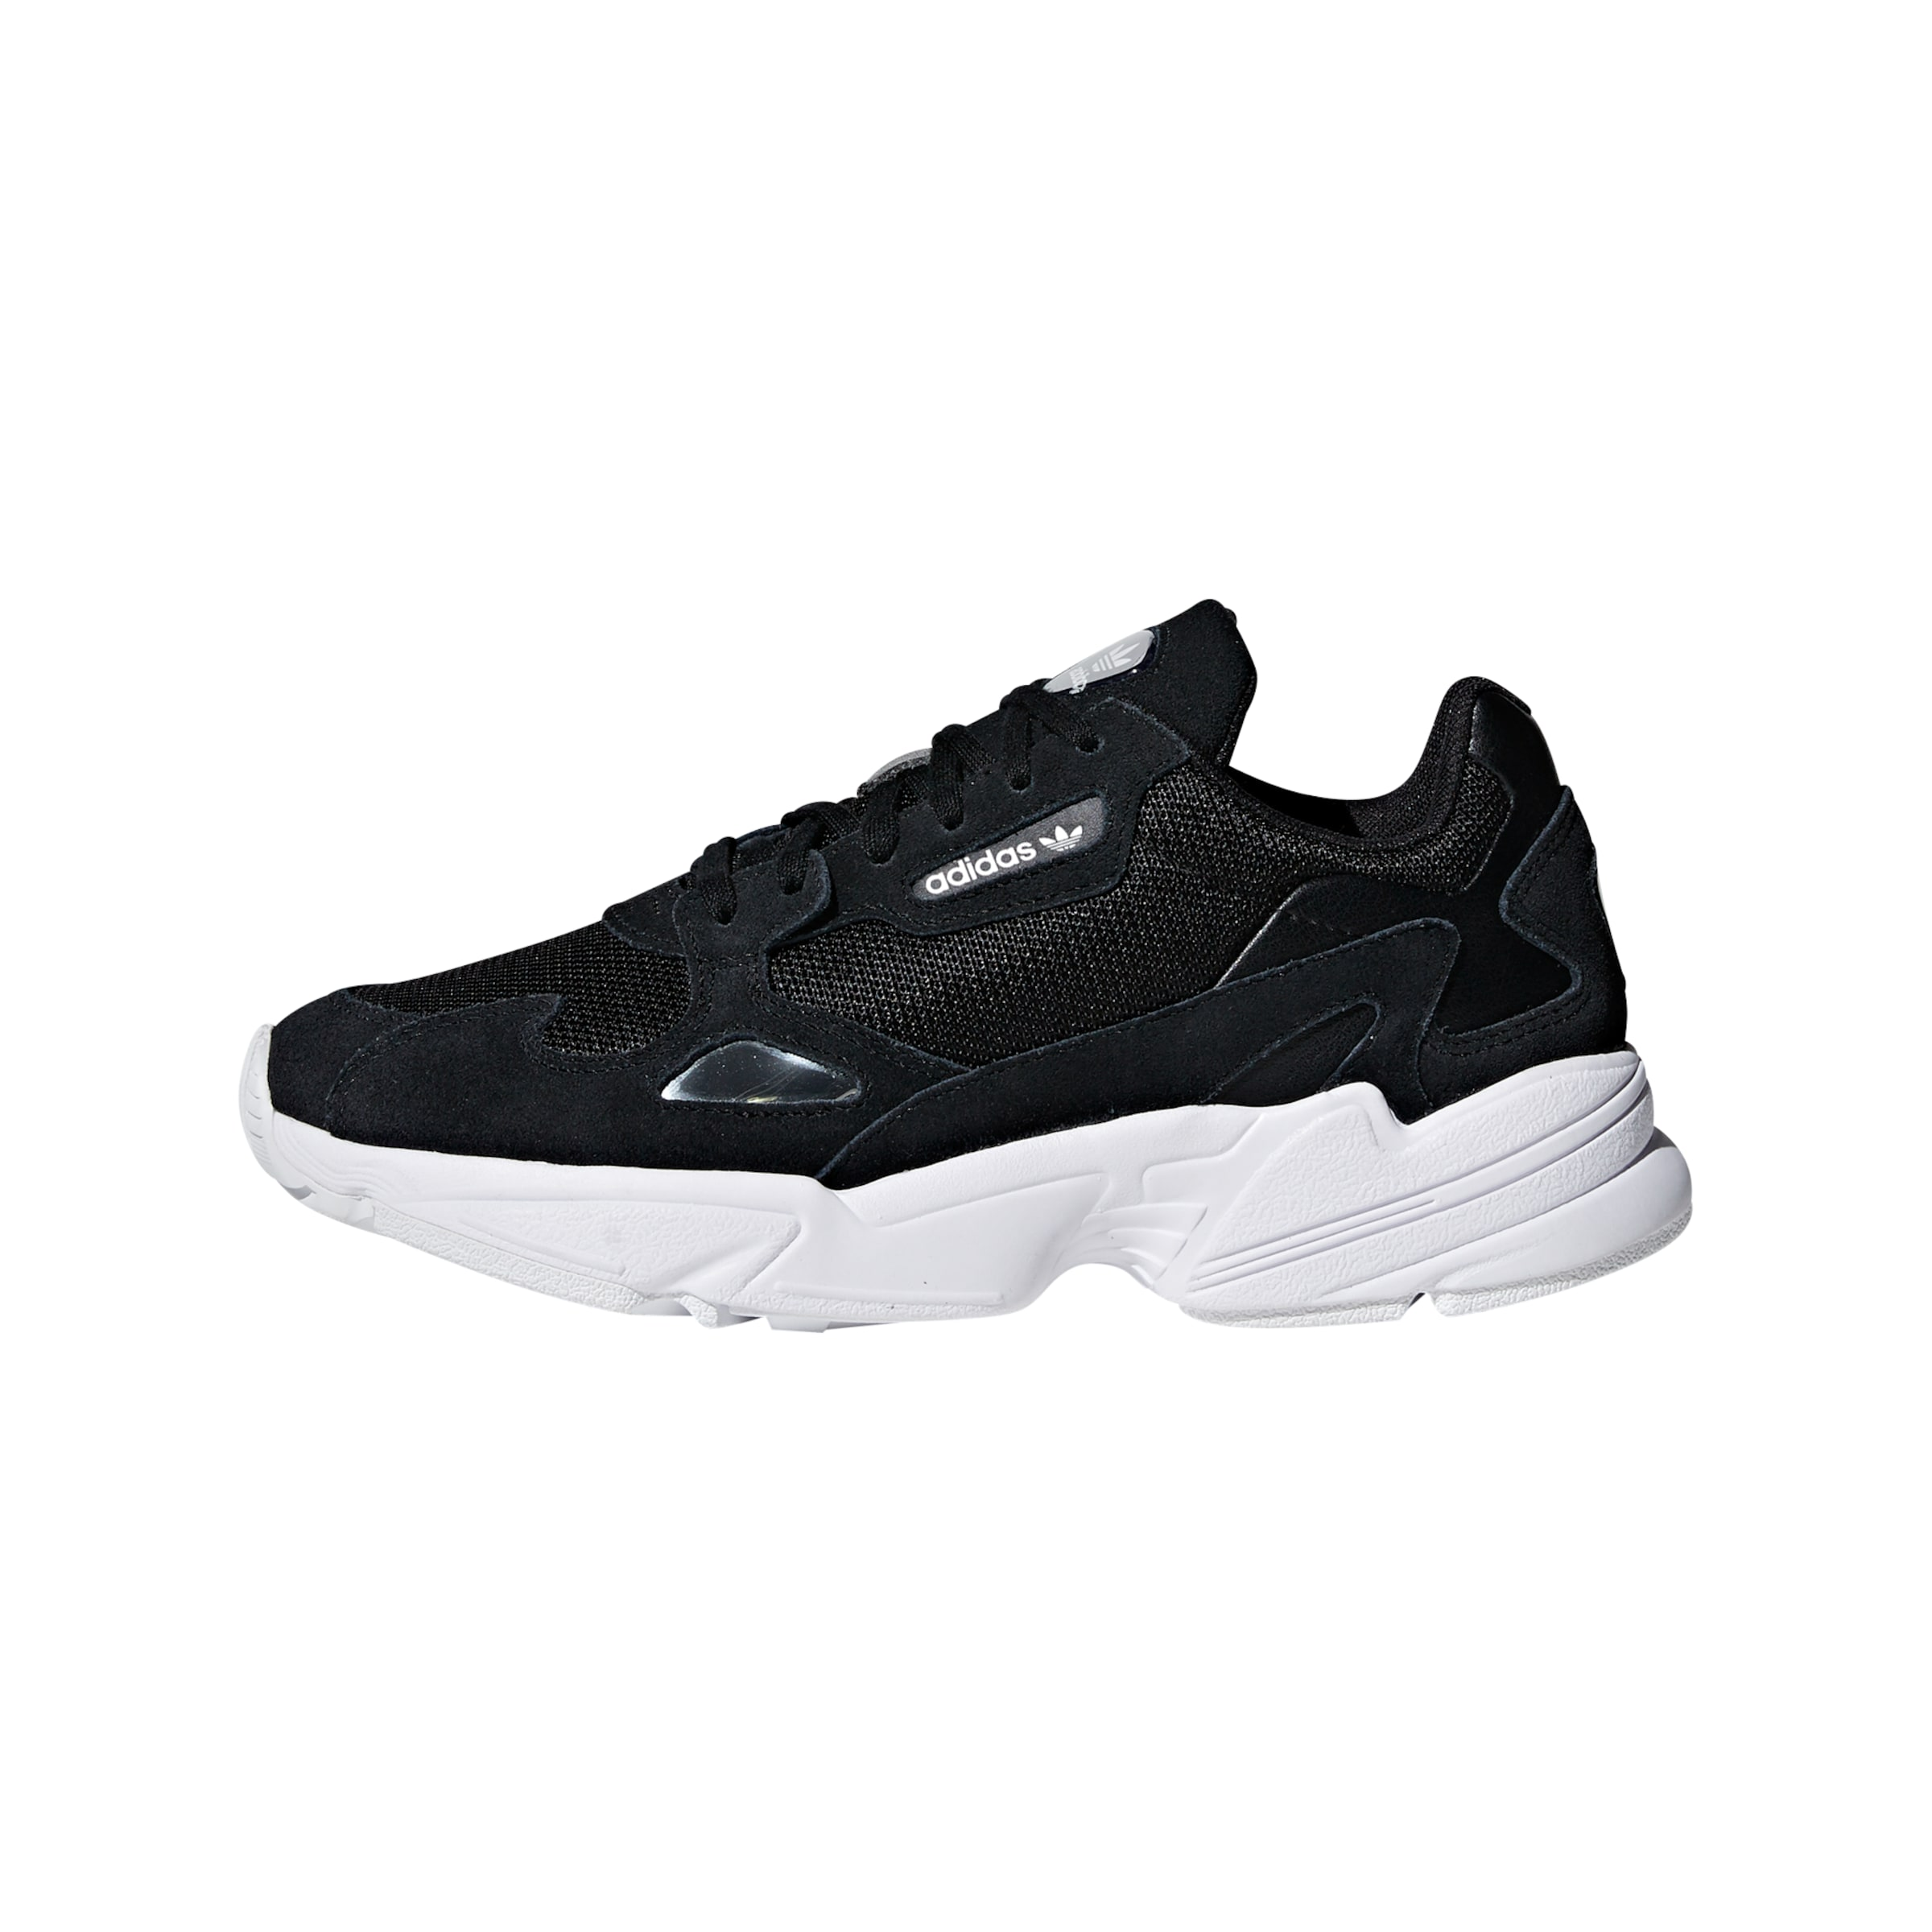 En Noir Adidas Originals Baskets Basses 'falcon' gyvYb6f7I